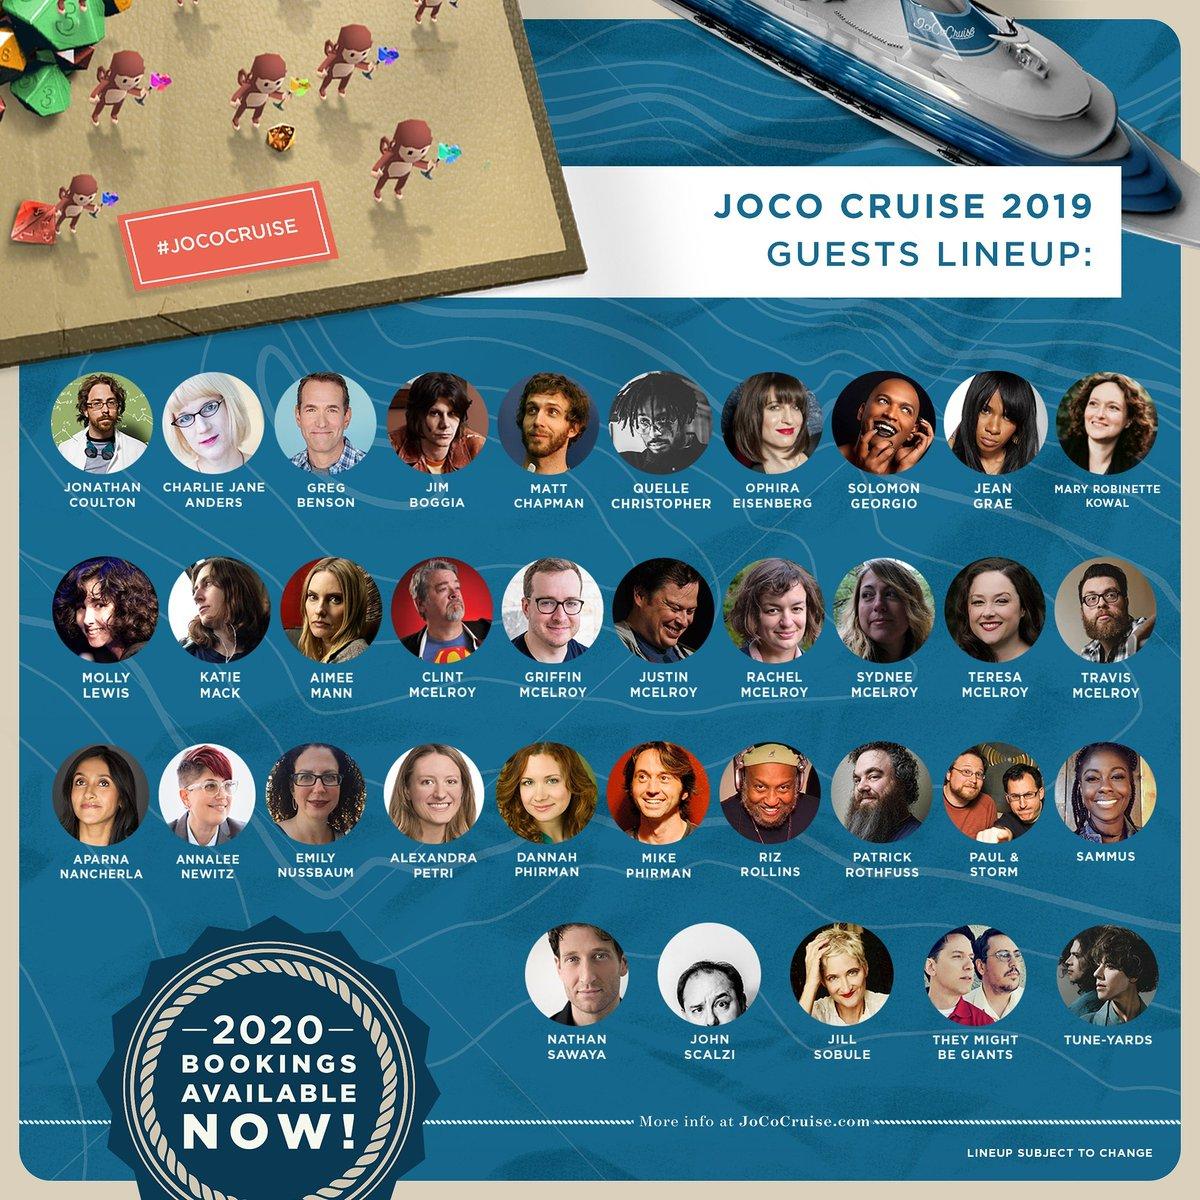 Joco Cruise 2020.Jococruise On Twitter Last Call For Joco Cruise 2019